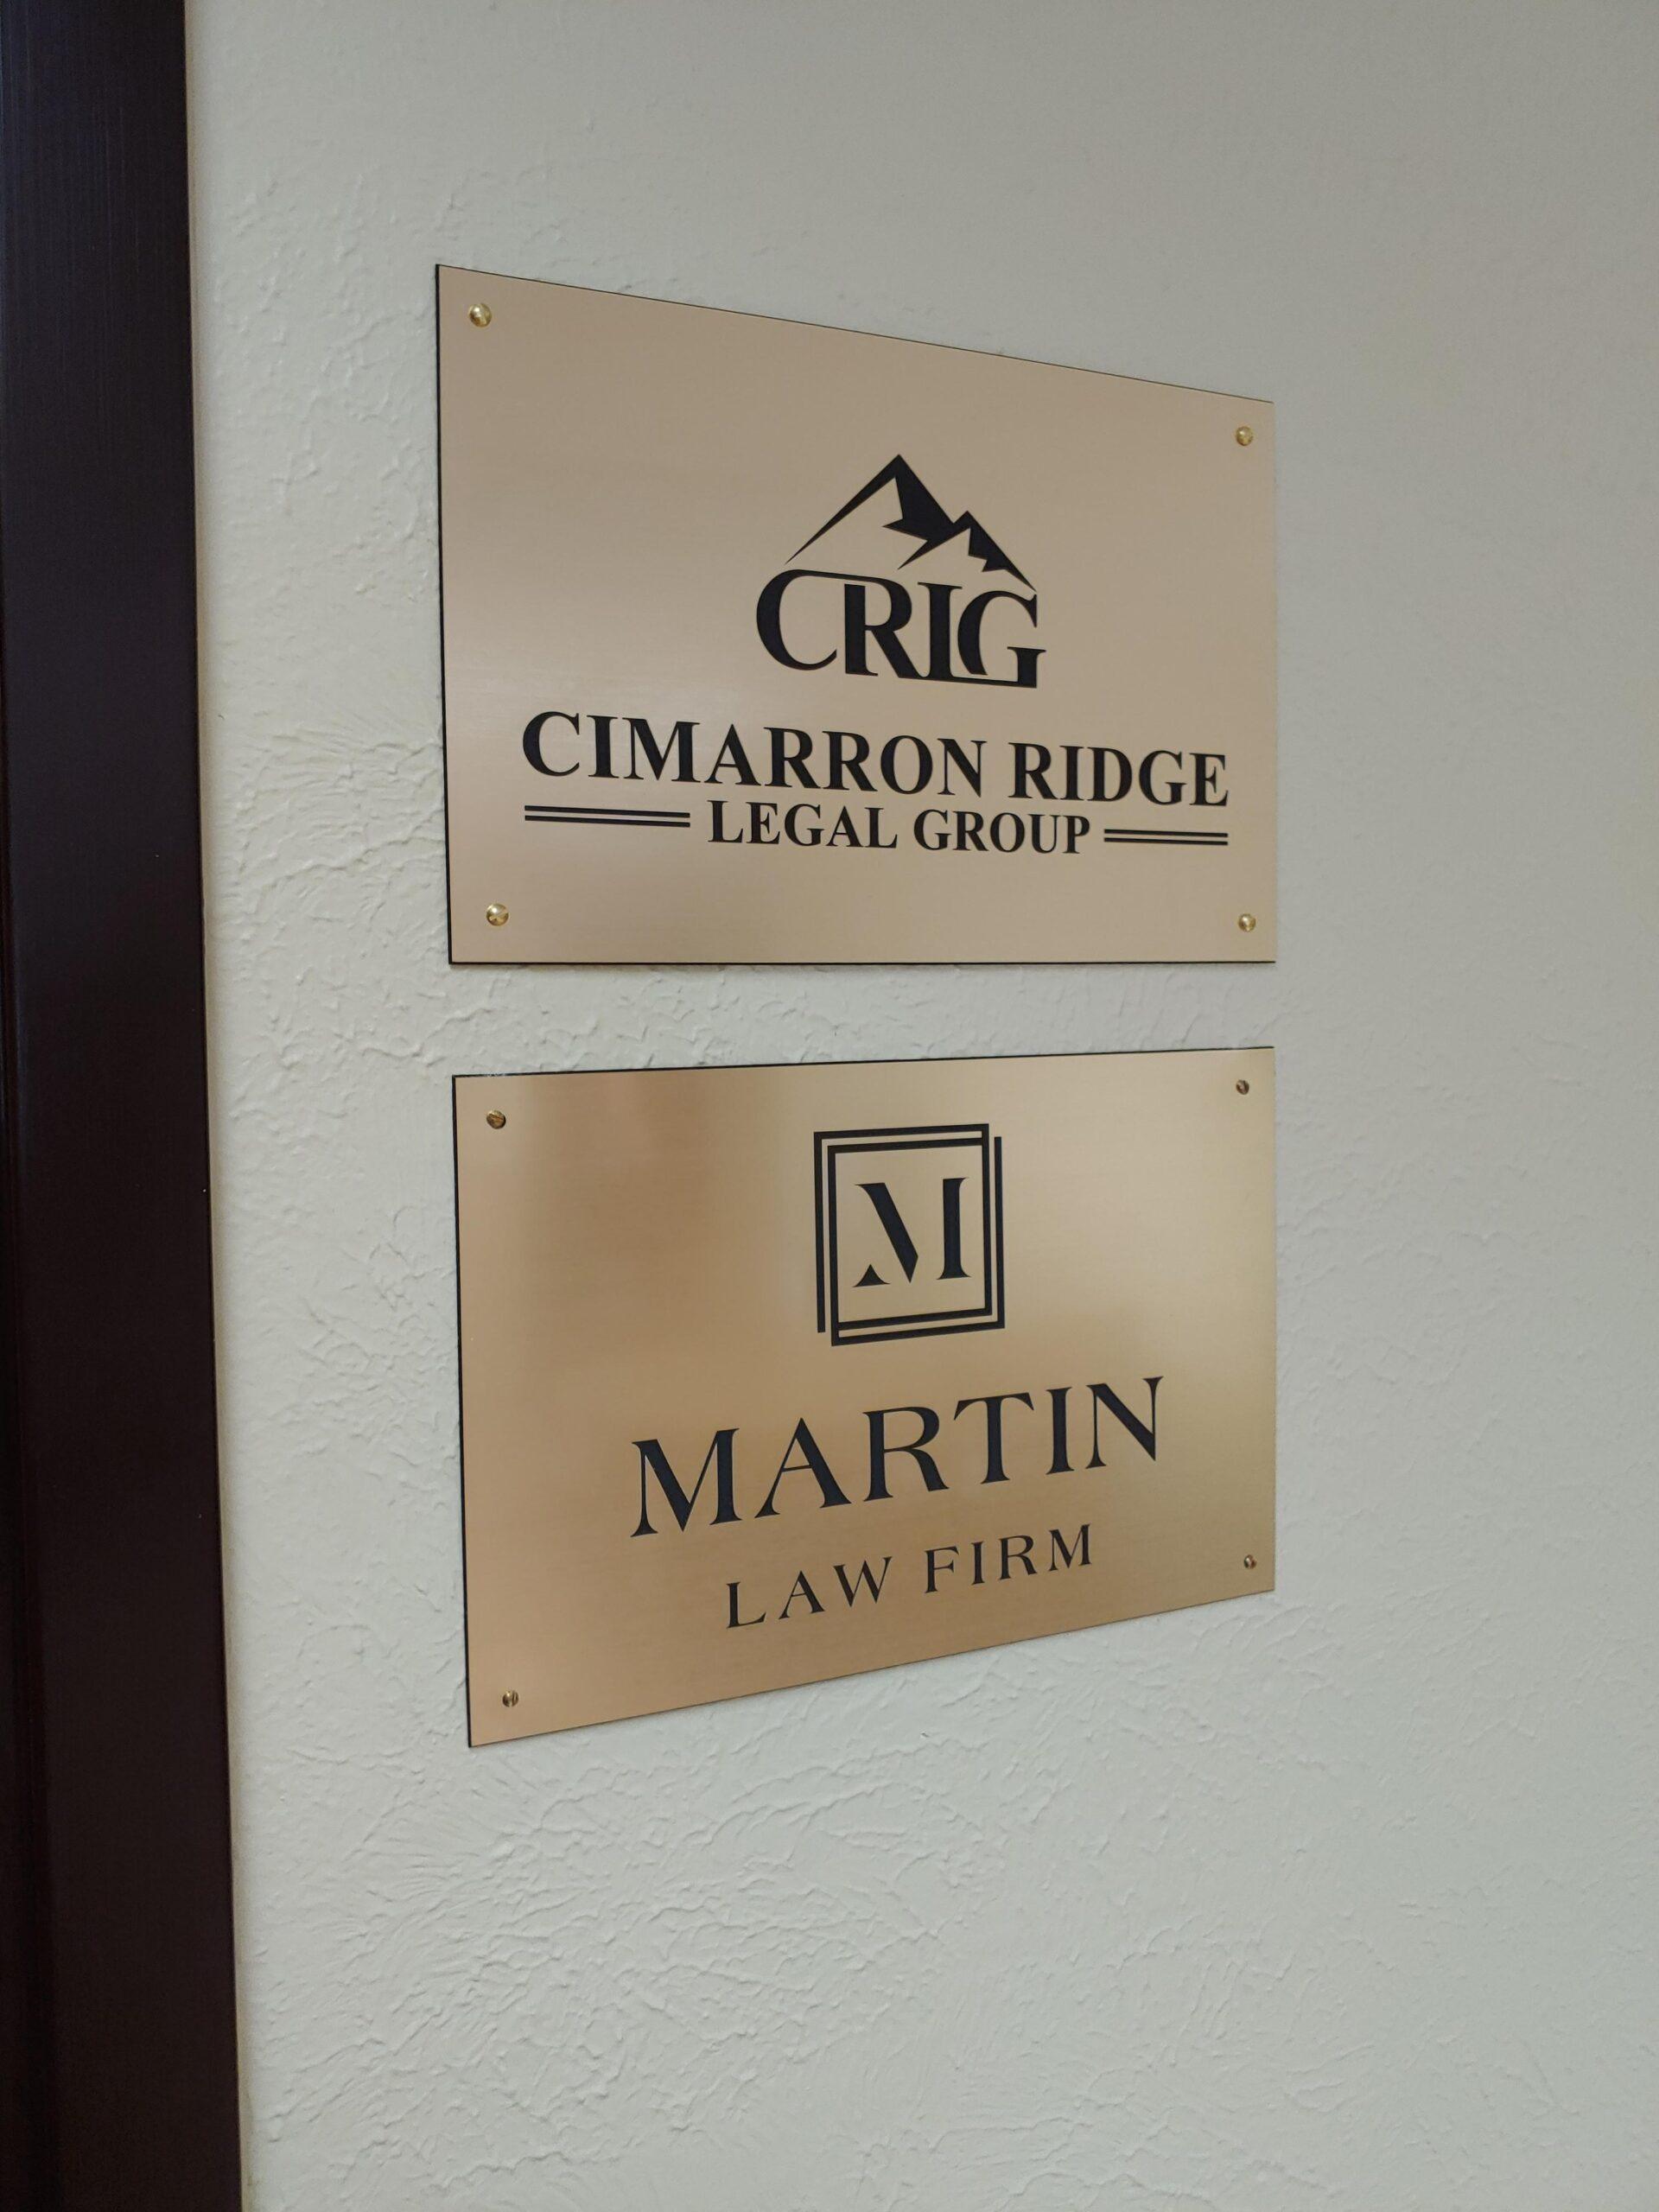 Martin Law Firm - Cimarron Ridge Office Signs